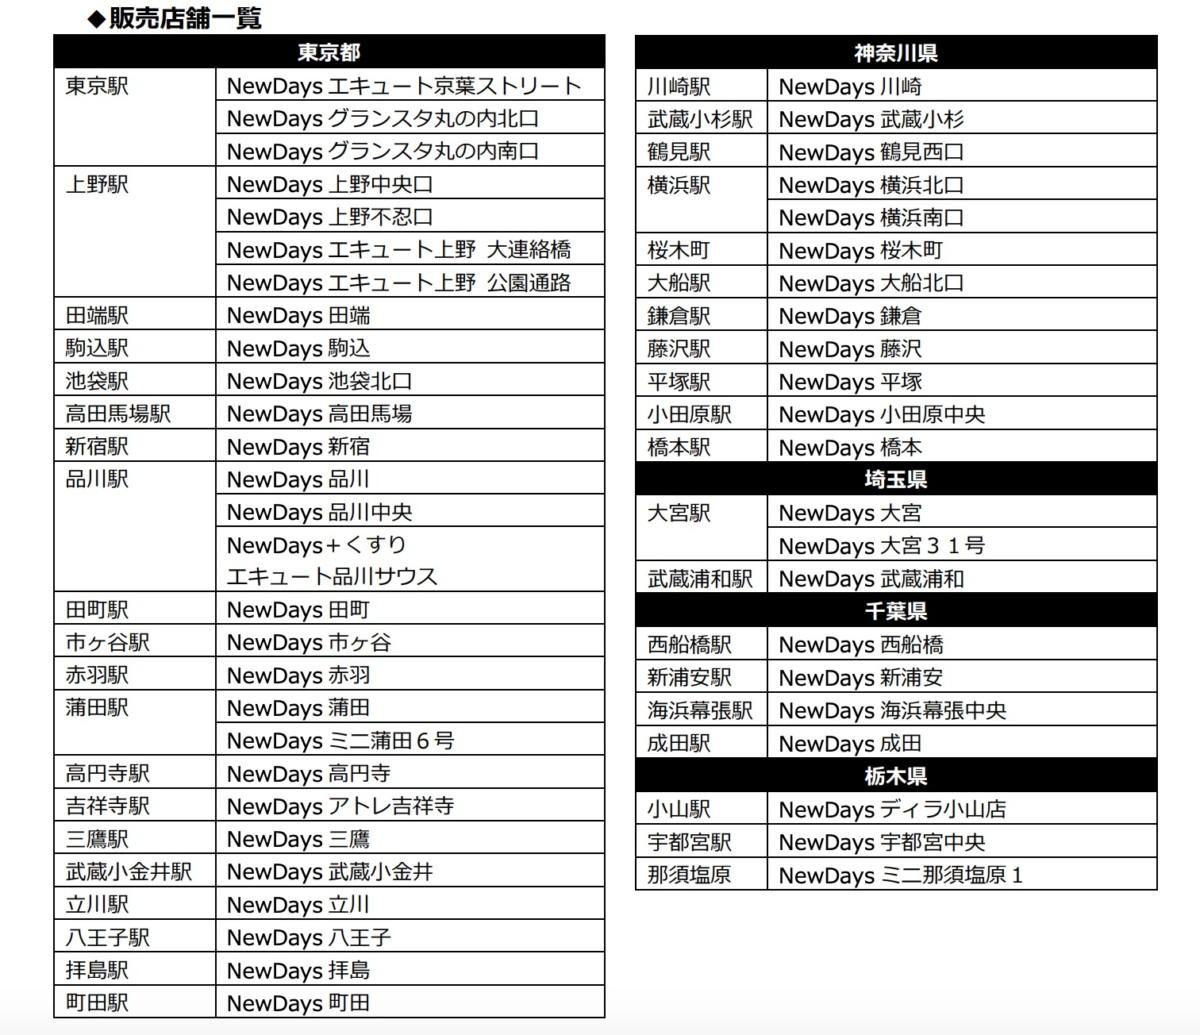 JR東日本 Suicaのペンギングッズ販売店舗一覧